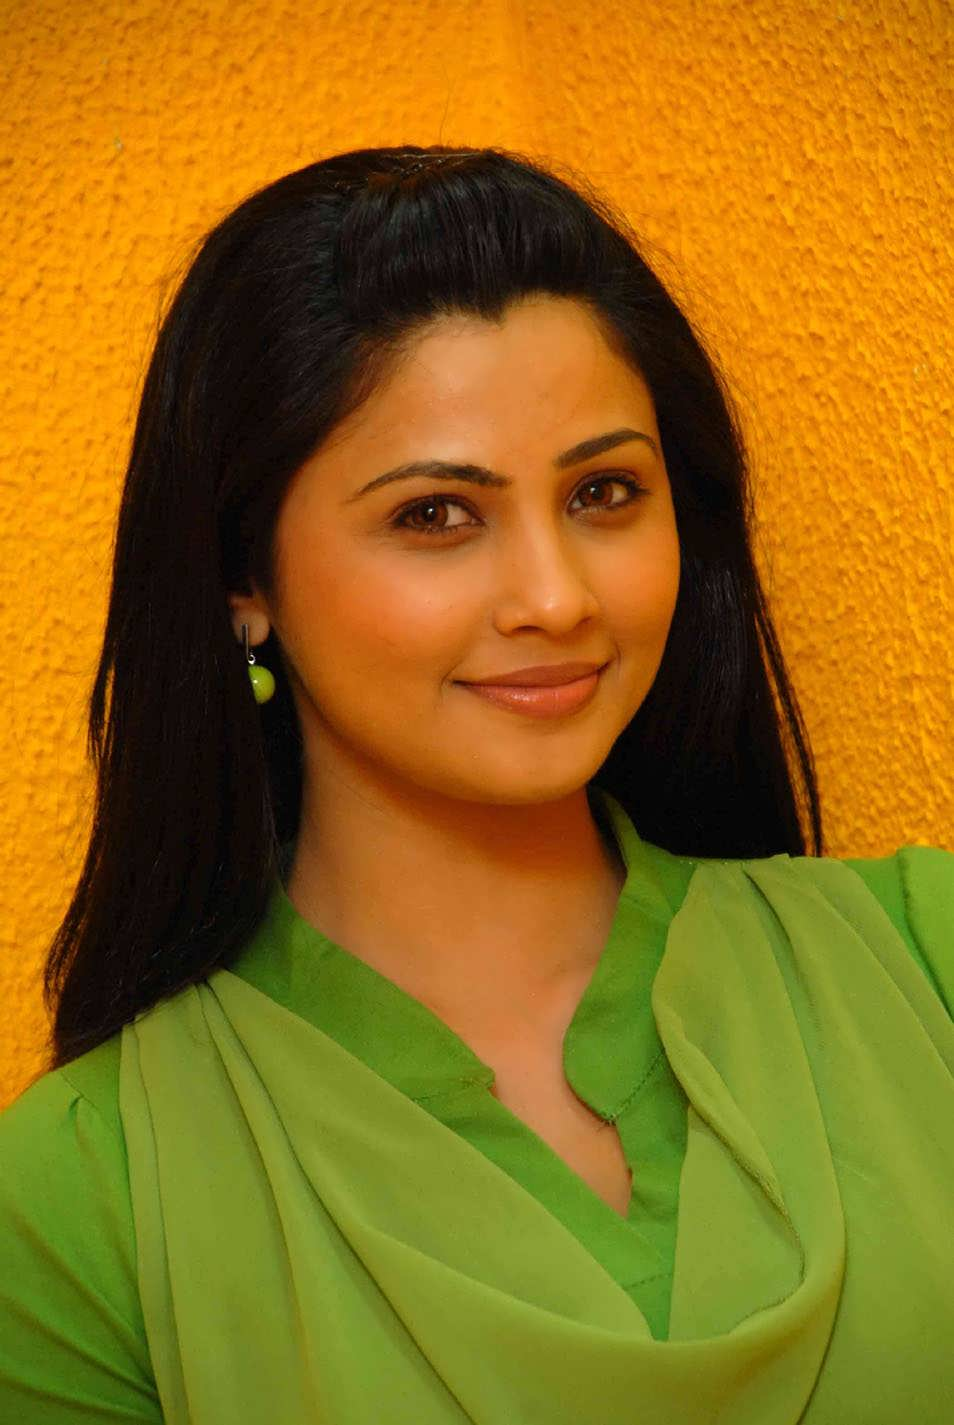 Anushka Shetty Cute Wallpapers Disha Shah Cute Photoshoot Tollywood Stars